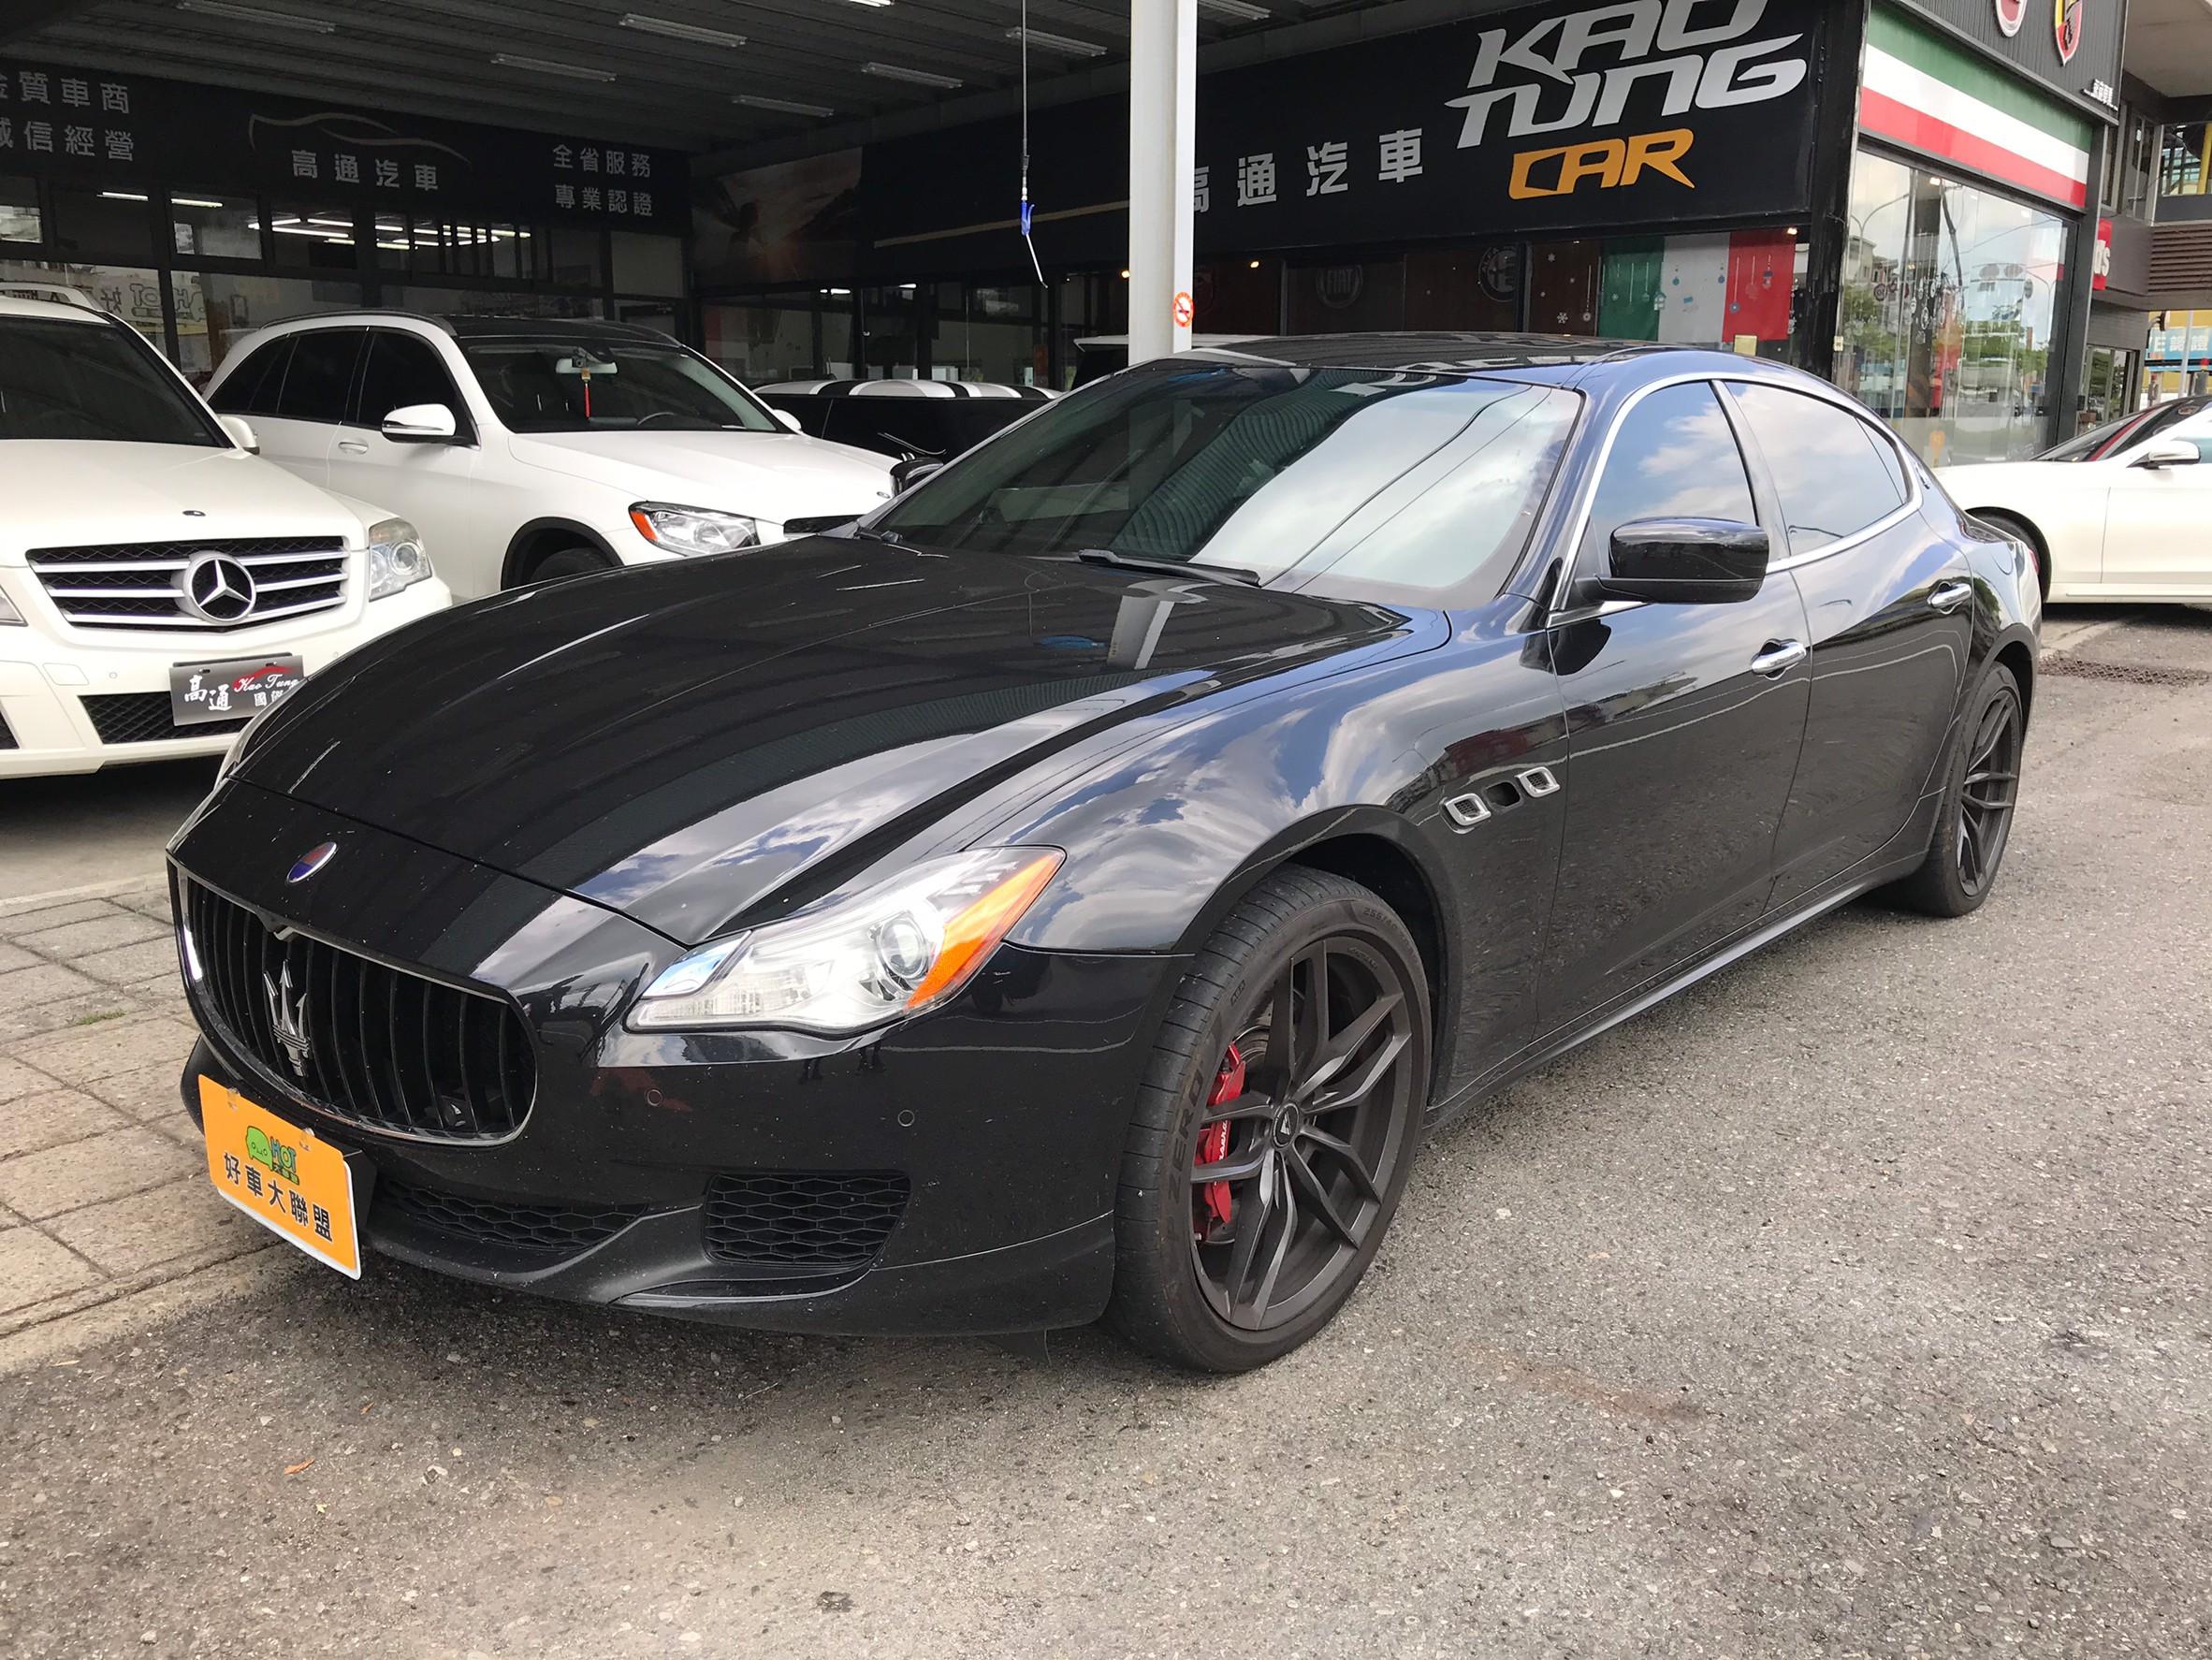 2013 Maserati 瑪莎拉蒂 Quattroporte